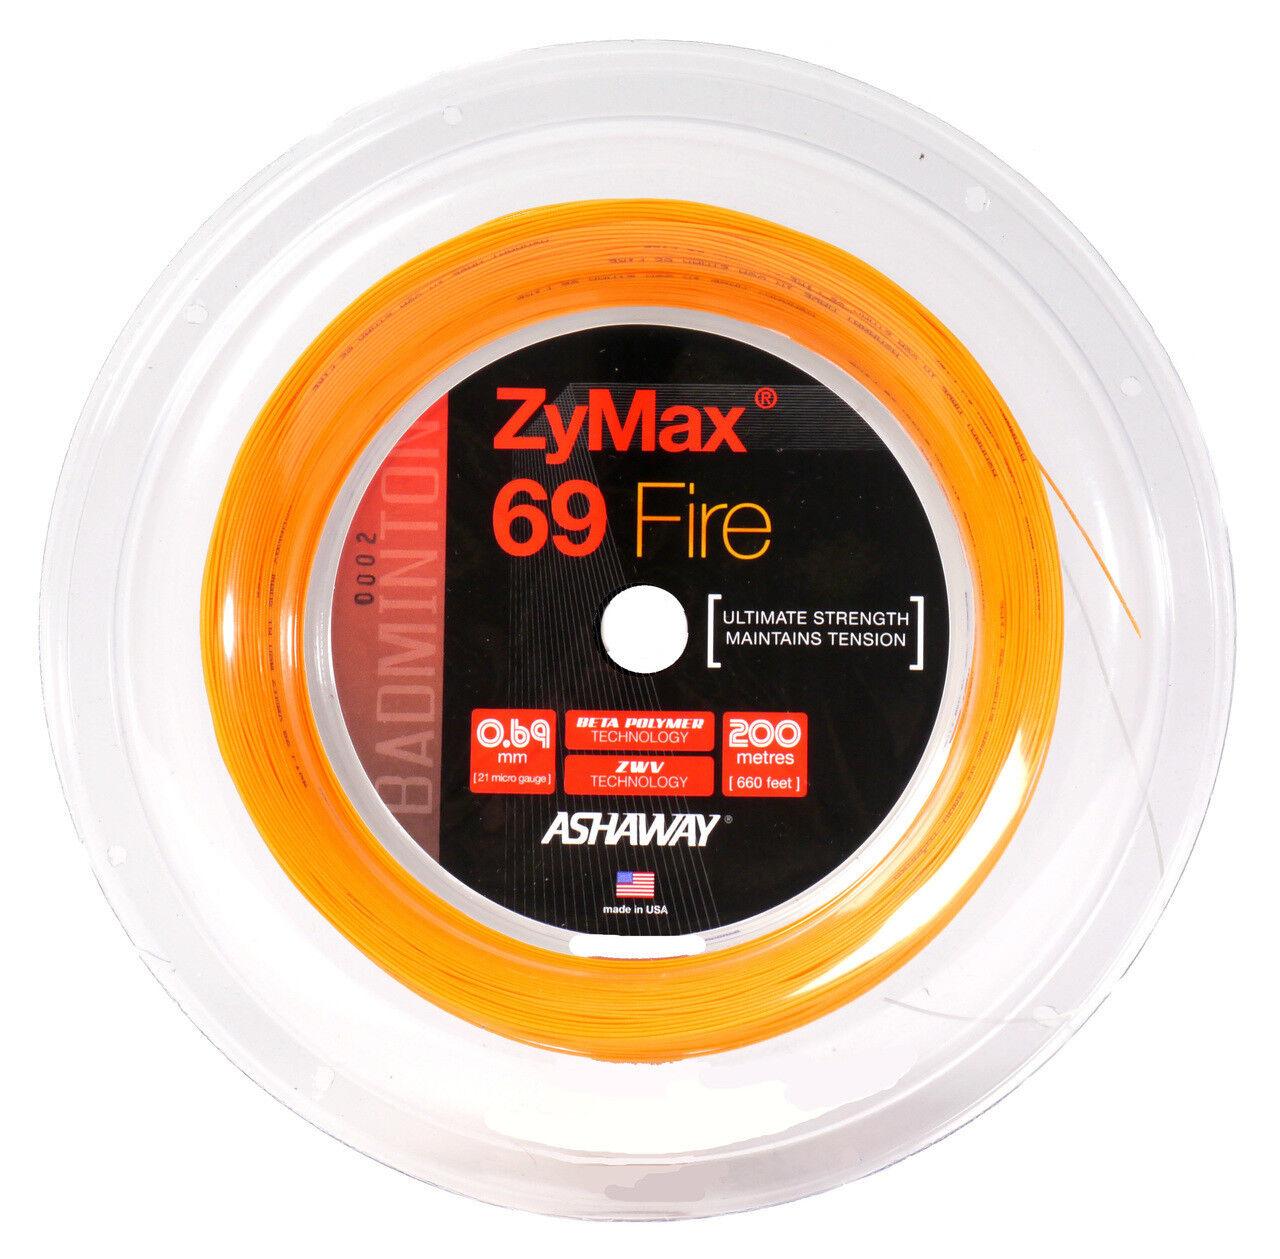 ASHAWAY ZyMax 69 69 ZyMax Fire Badminton String 200m Reel 6dfa1d